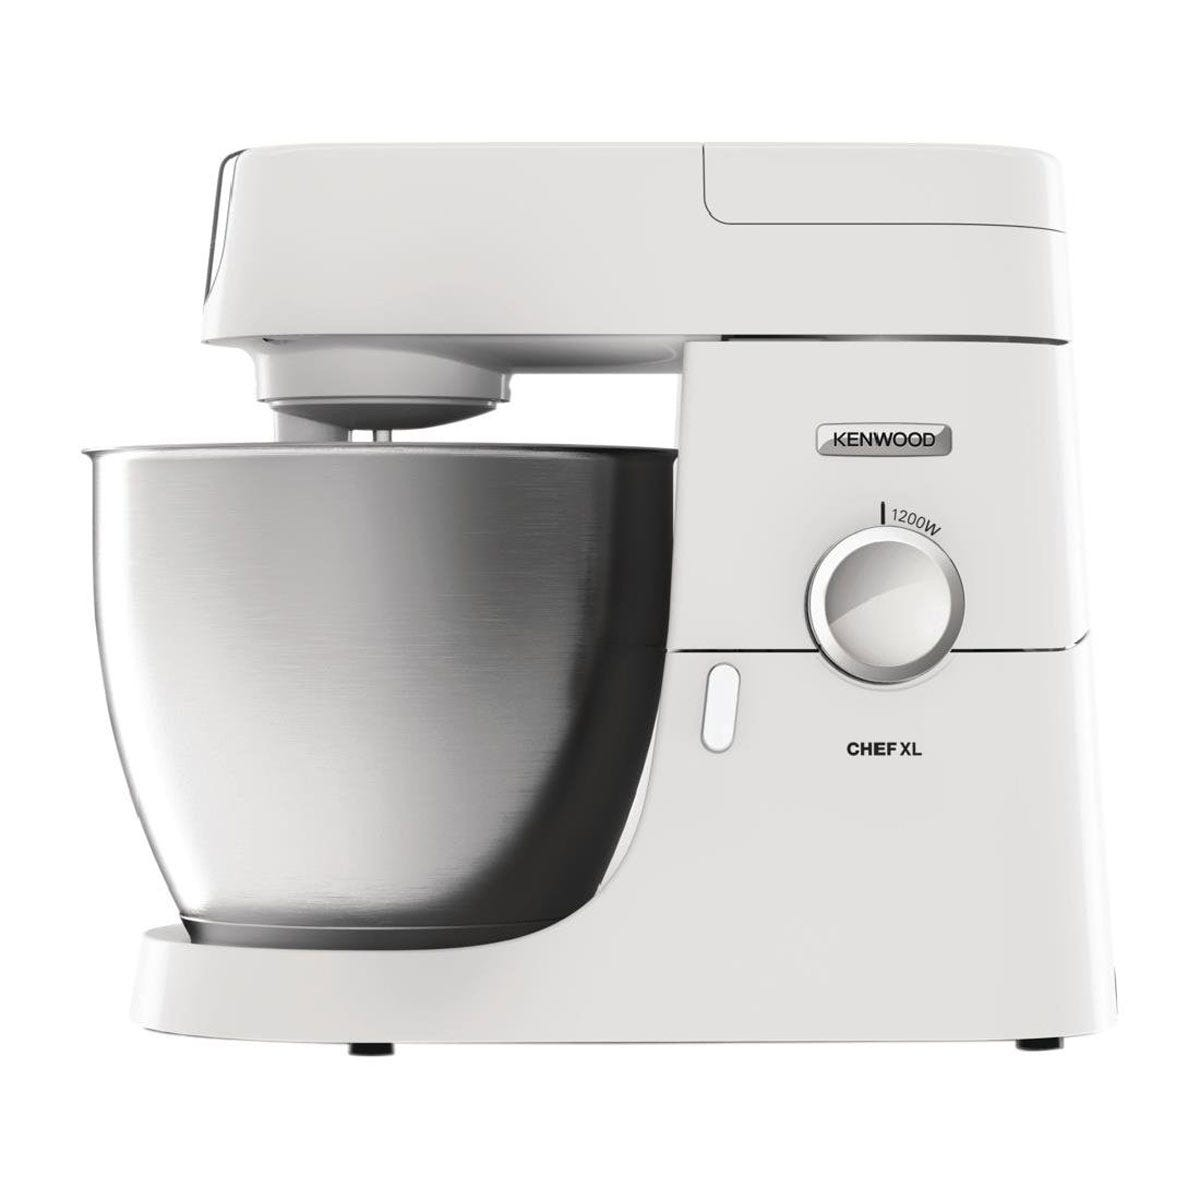 Kenwood KVL4100W 1200W 6.7L Chef XL Stand Mixer - White